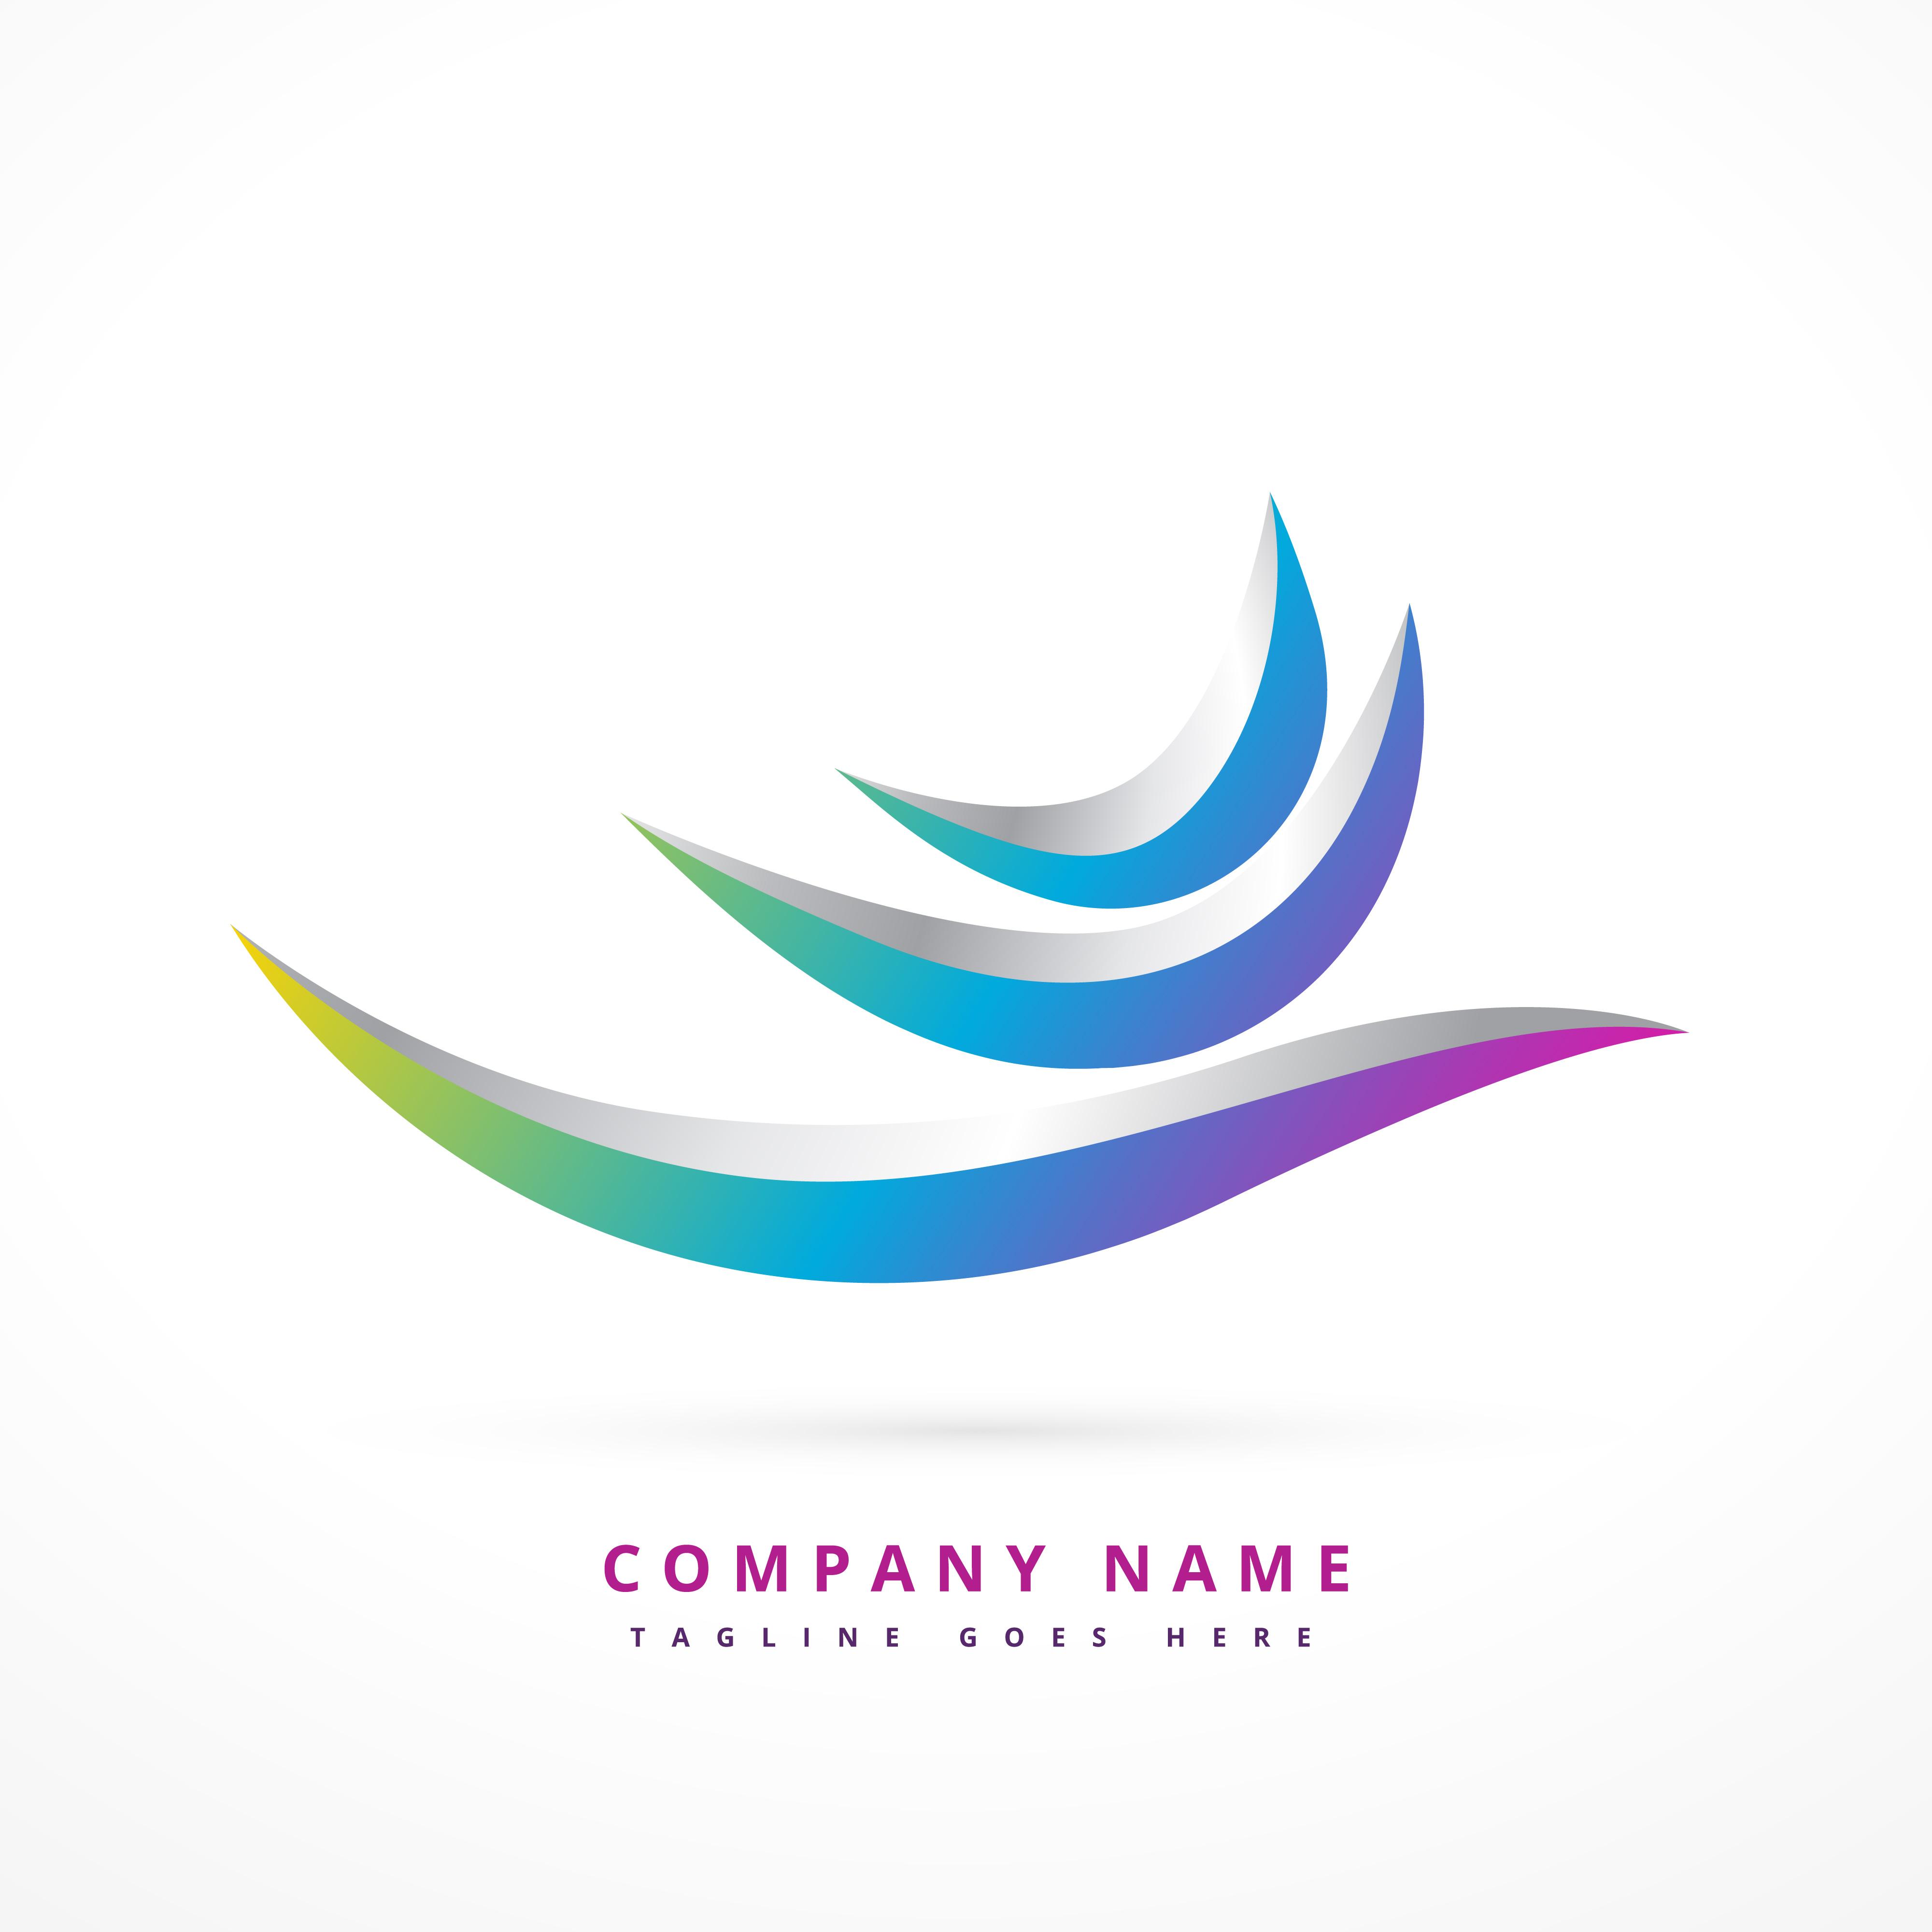 abstract logo shape design illustration - Download Free ...